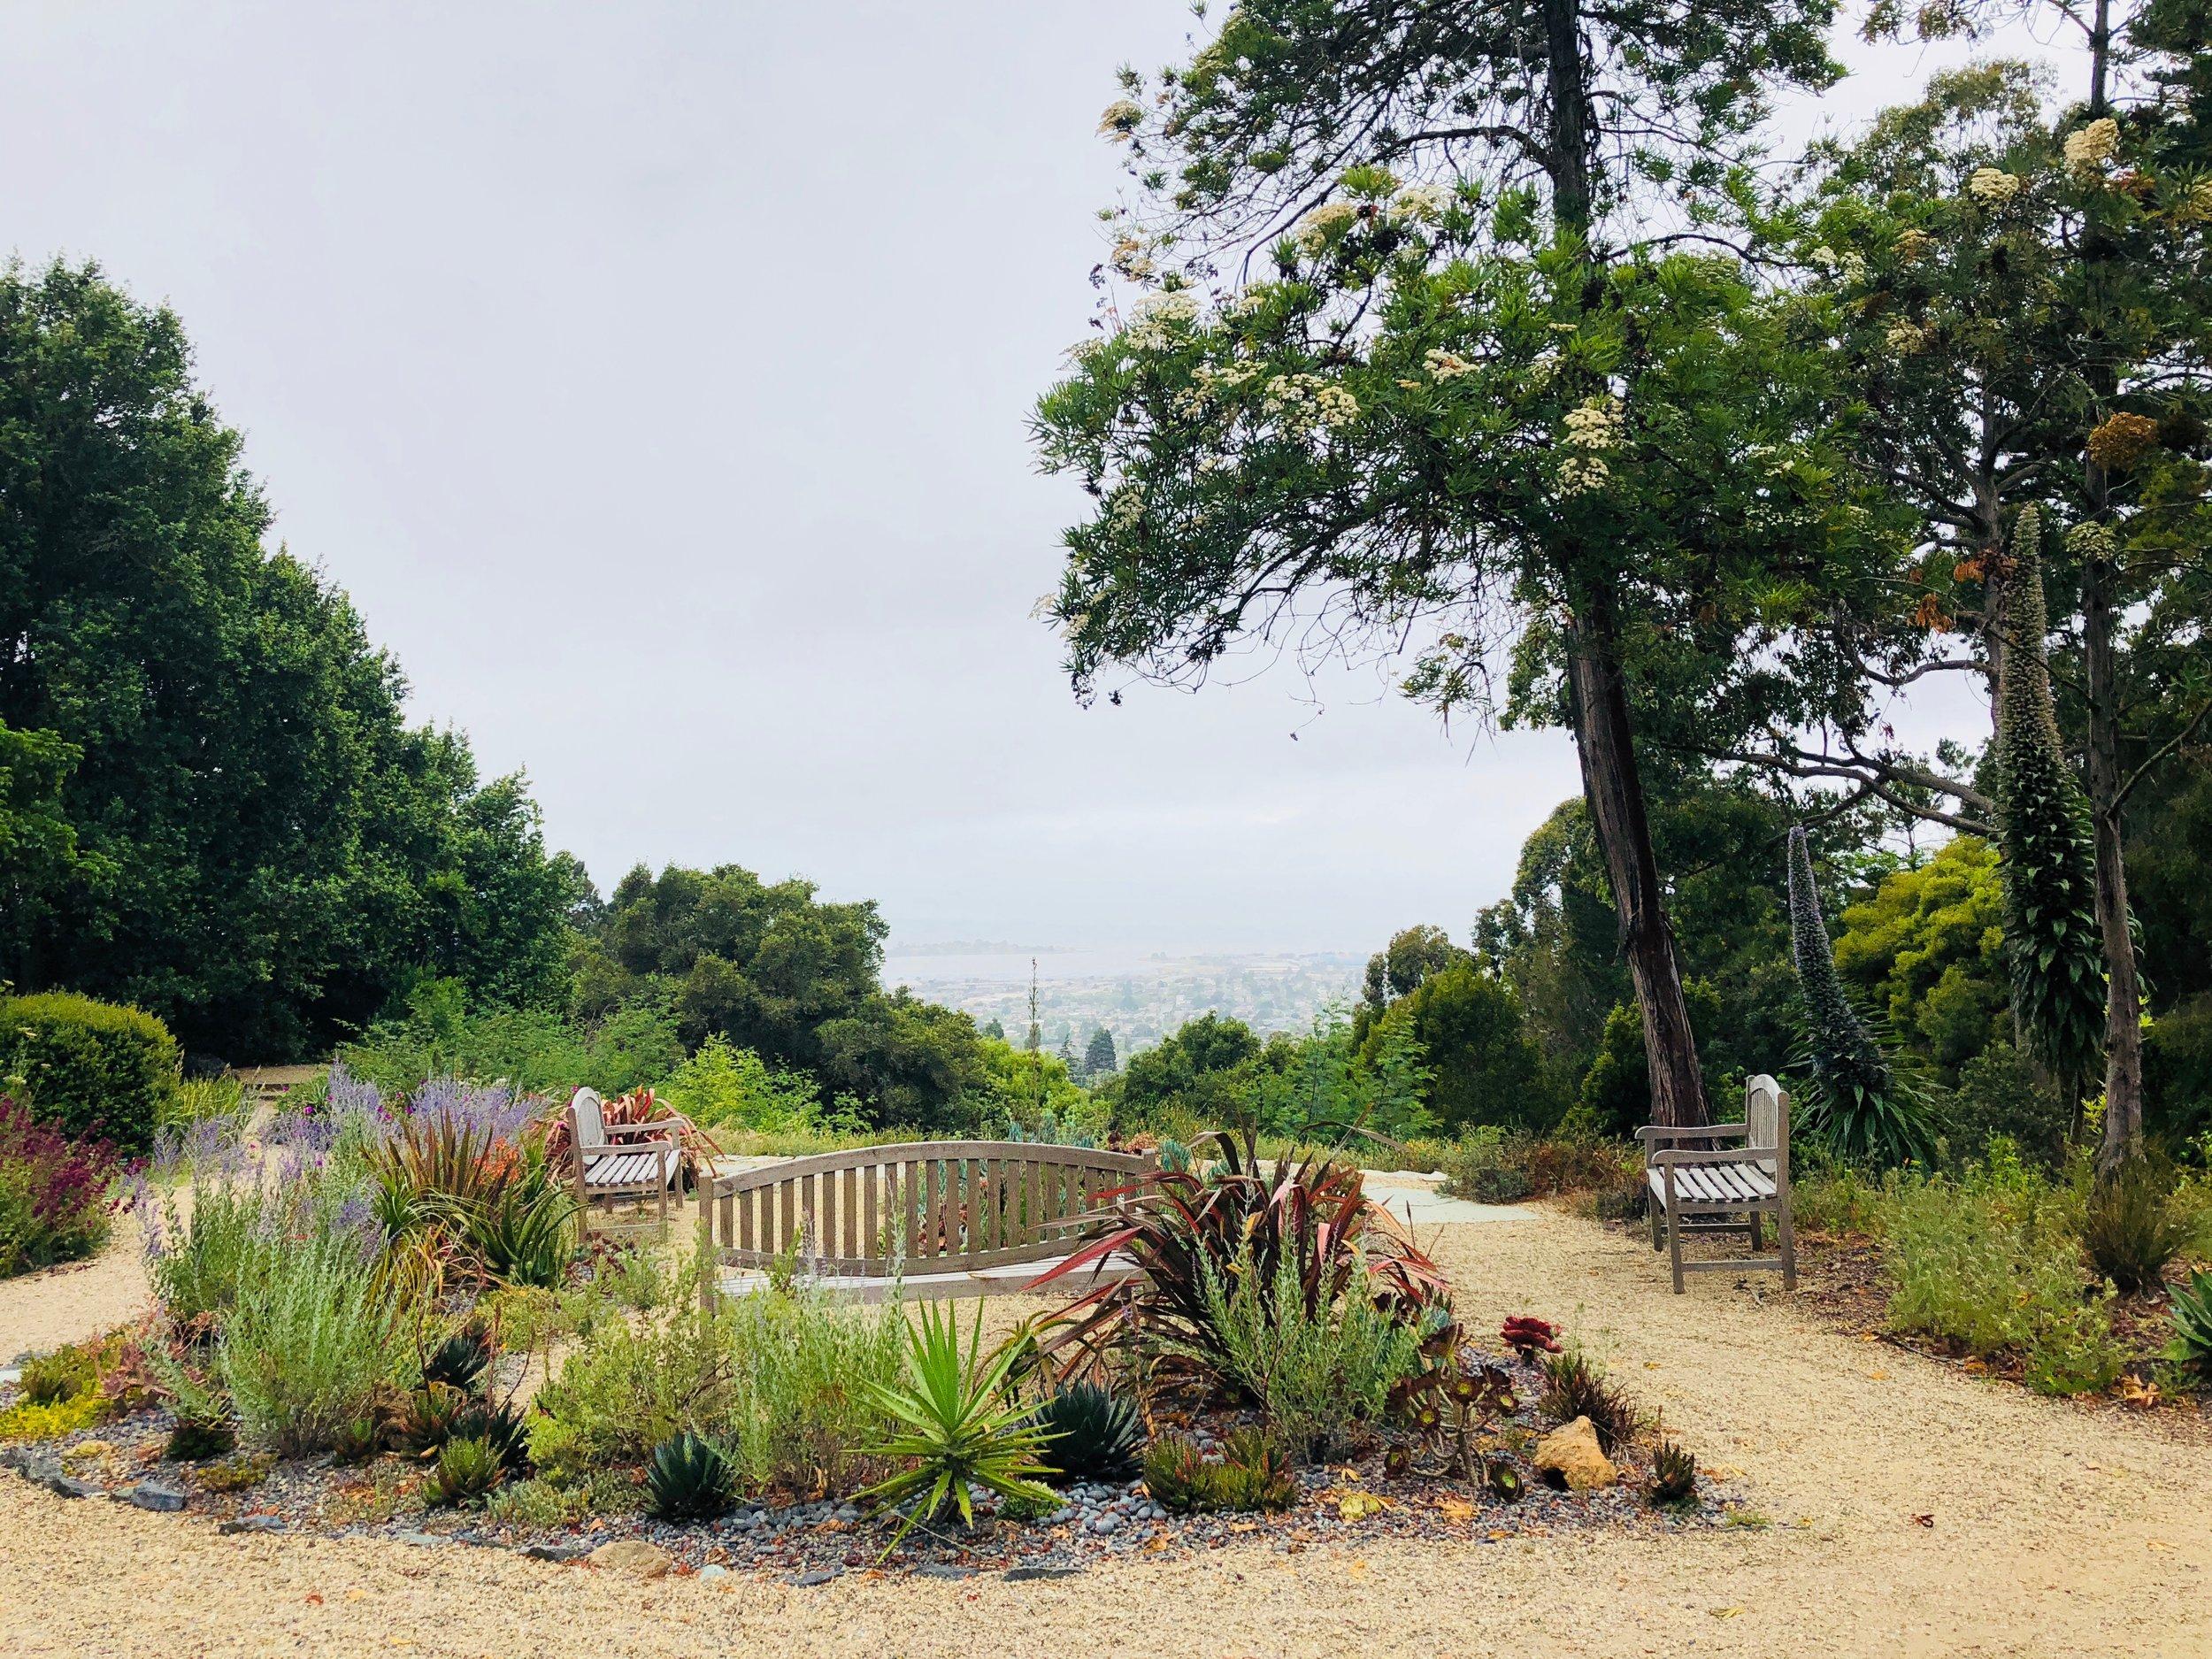 Blake Garden overlook in Fall 2018. Photo by Sahoko Yui.